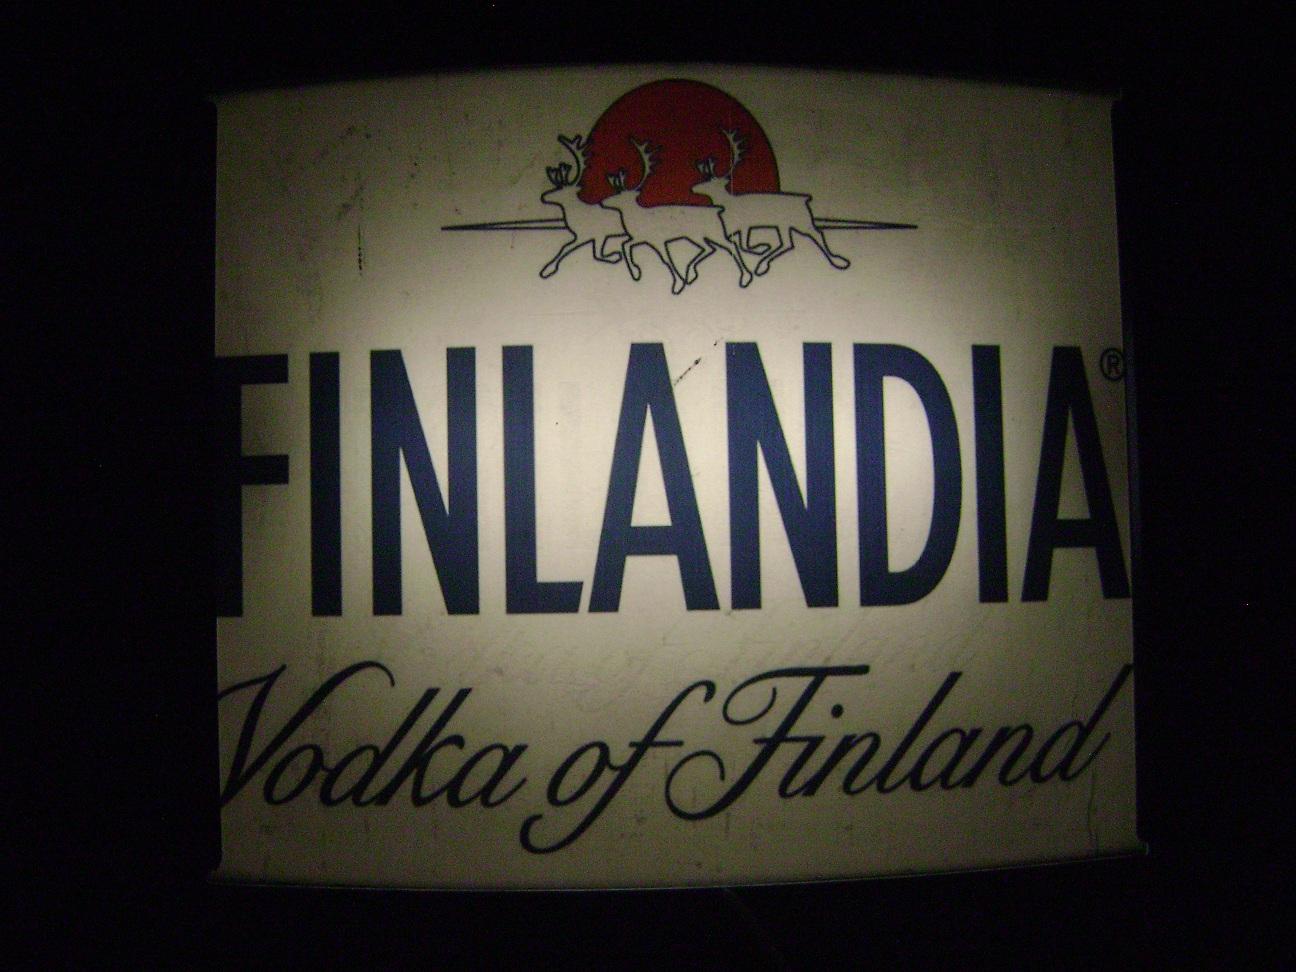 Reklama_svetleca_Finlandia_vodka_3.jpg